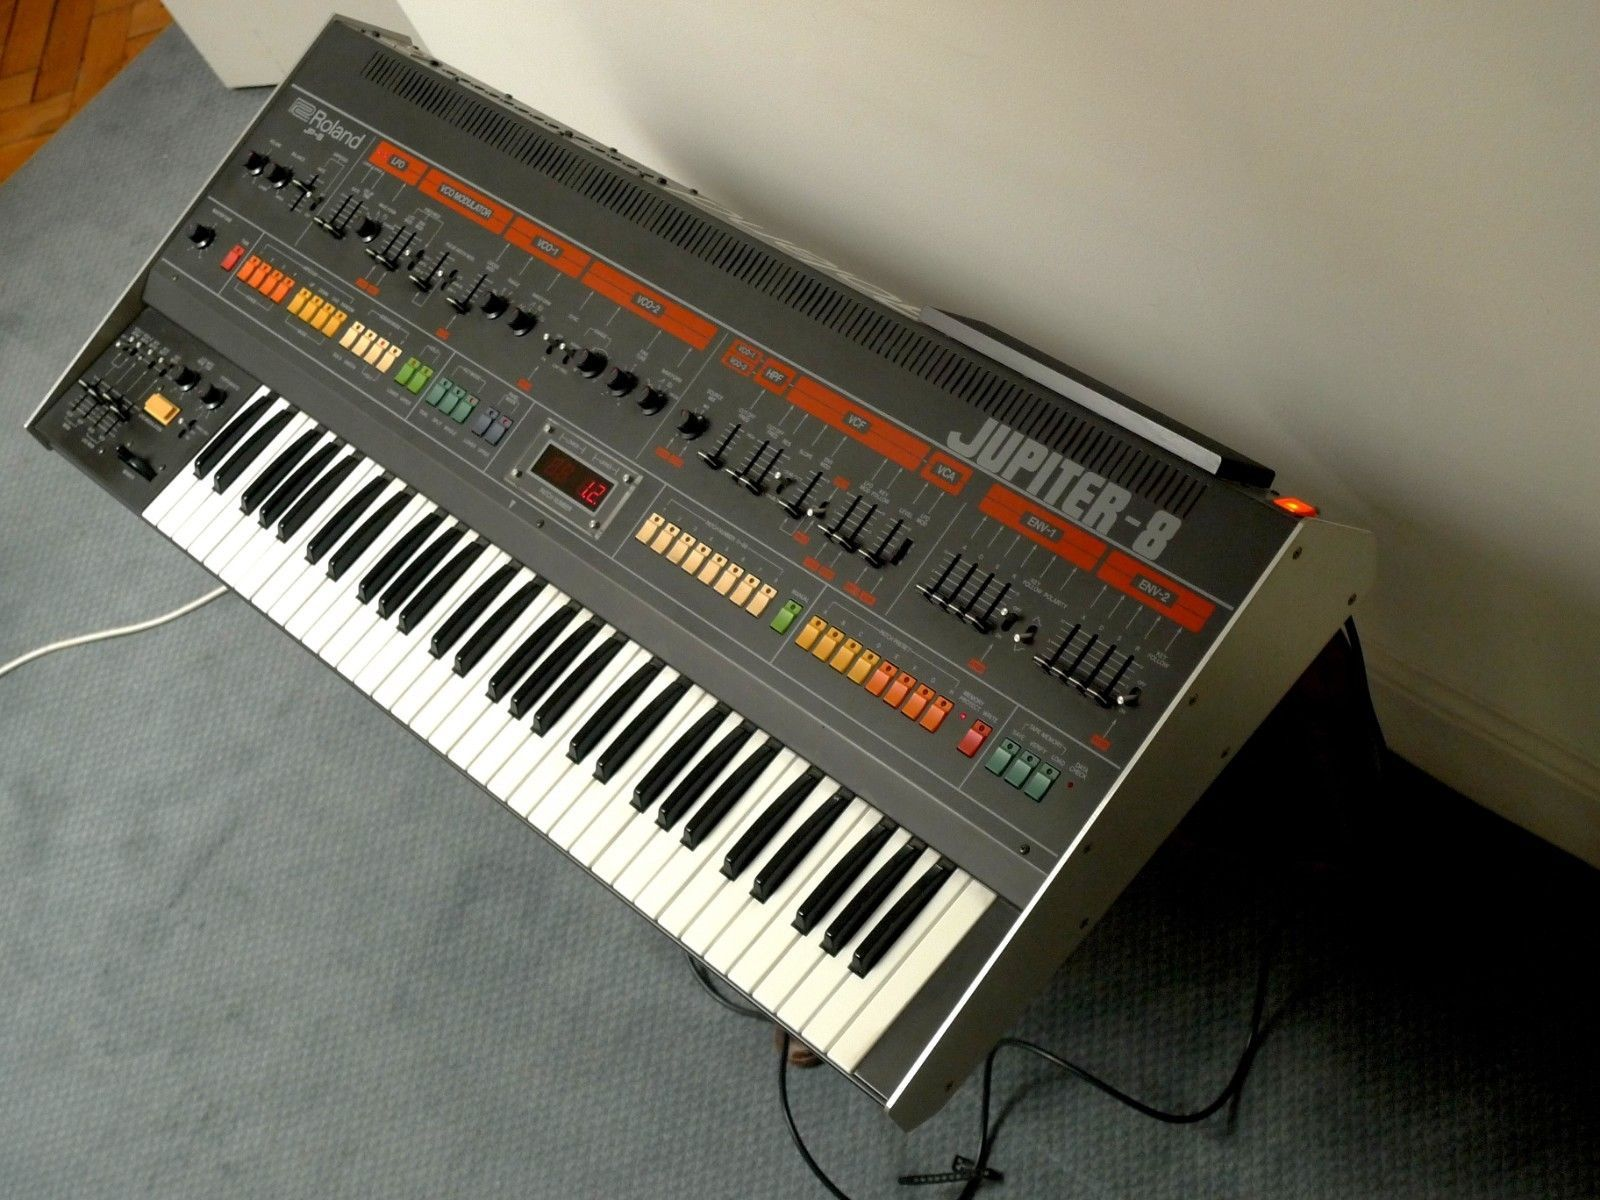 A-500PRO-R MIDI 49-key Keyboard Controller | Products